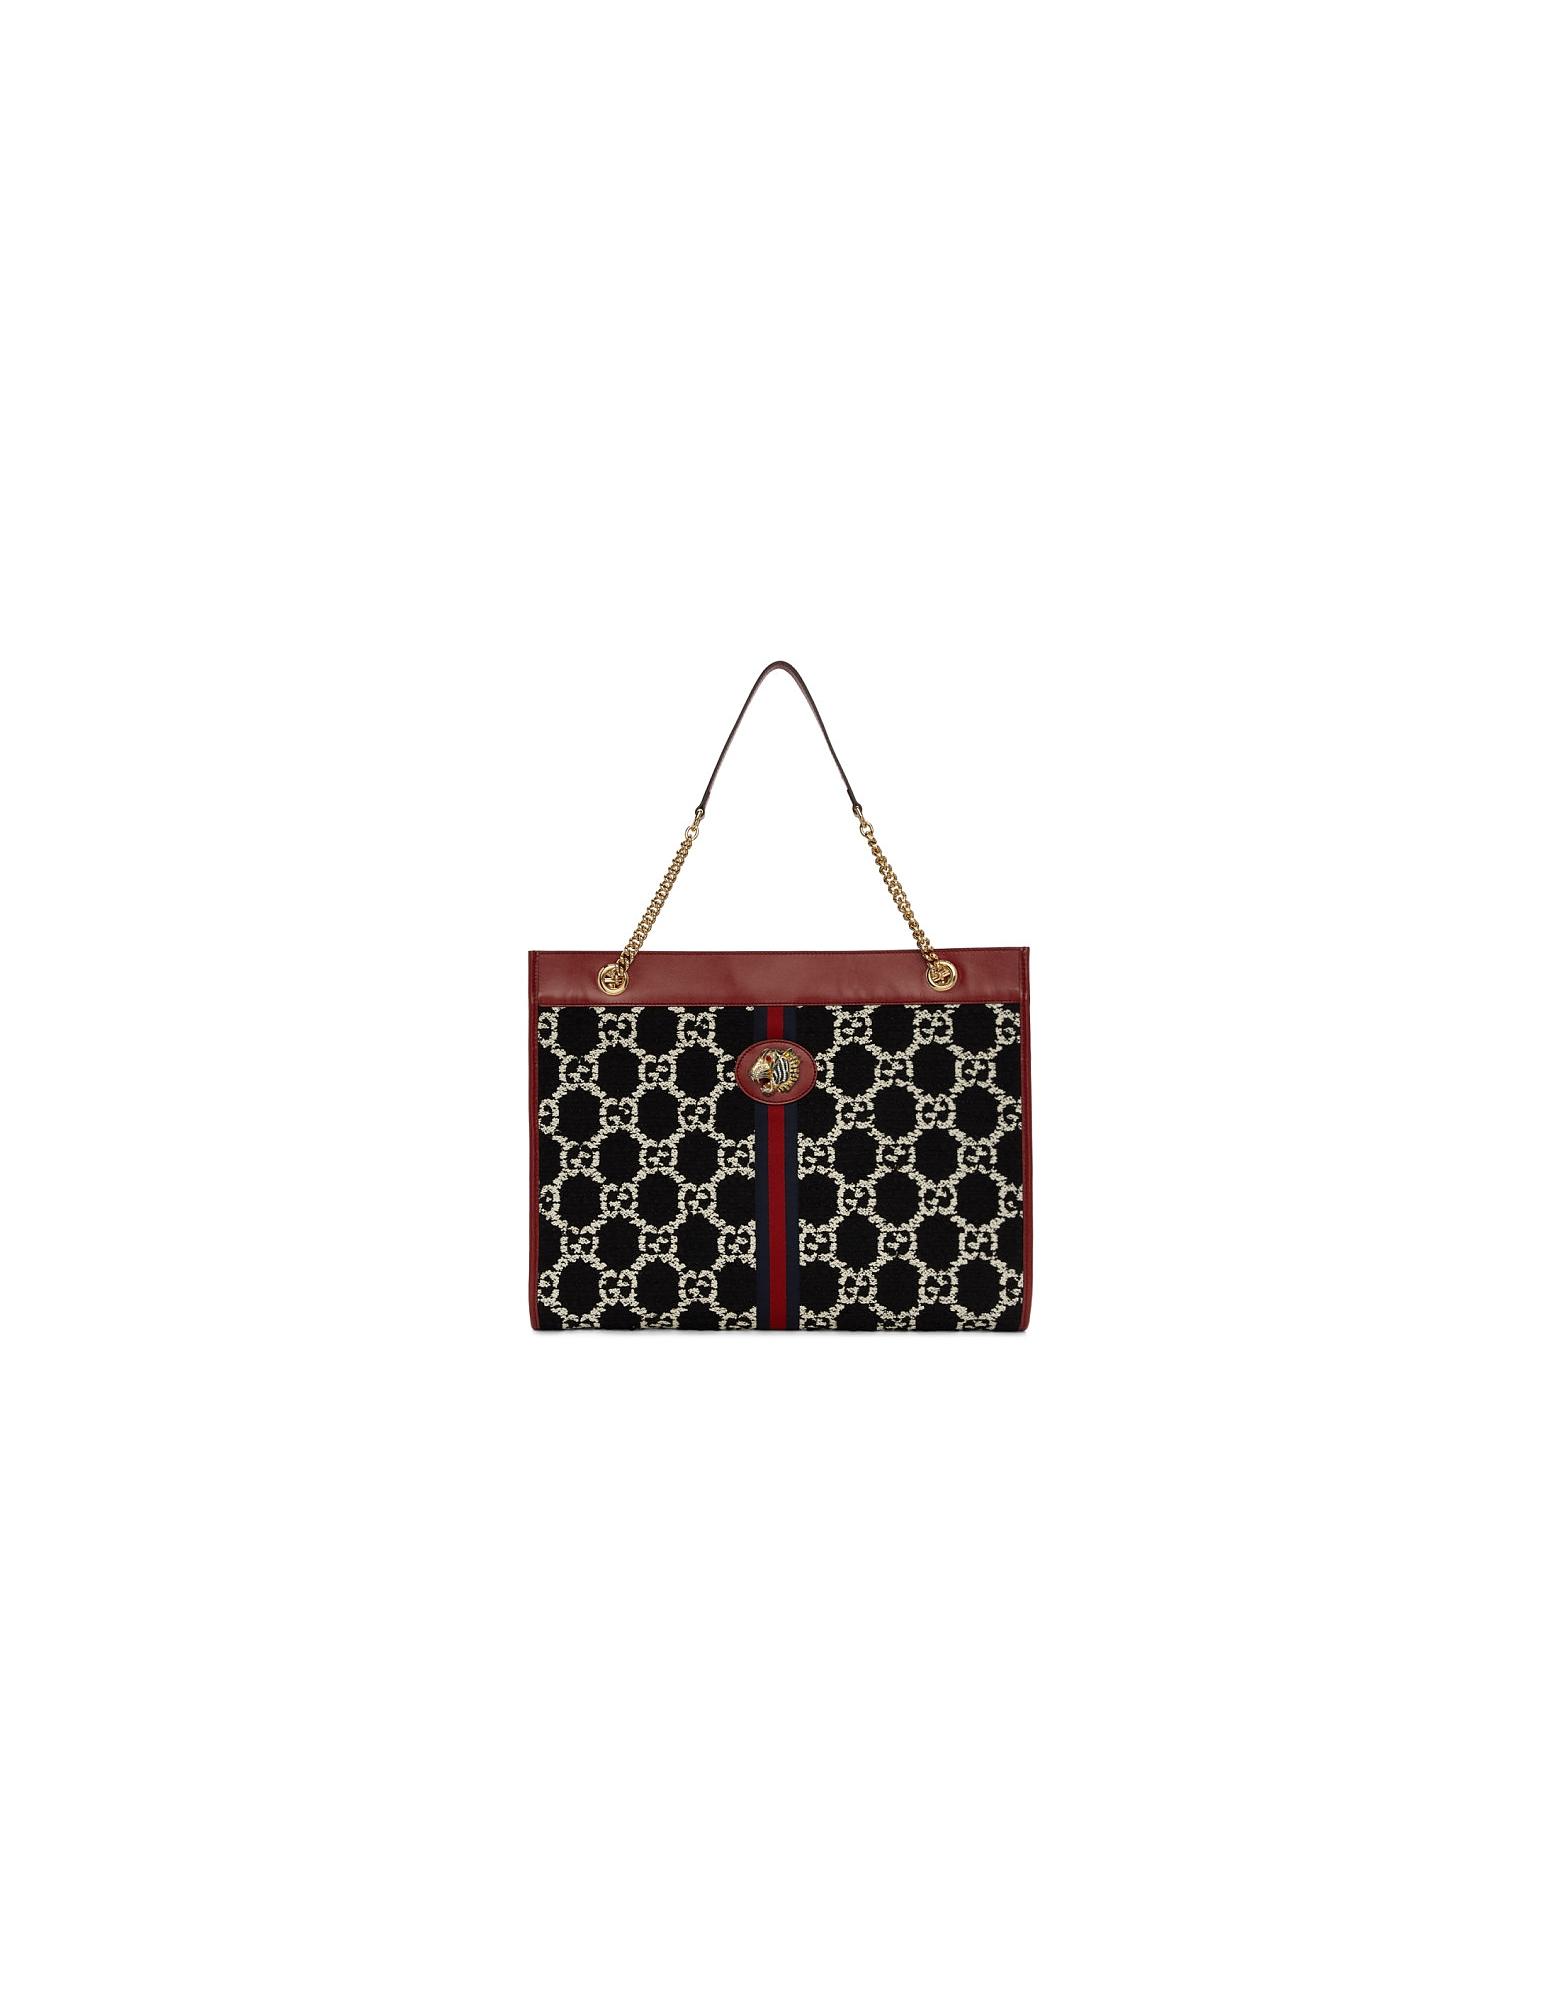 Gucci Designer Handbags, Black and White Large Rajah GG Supreme Tote